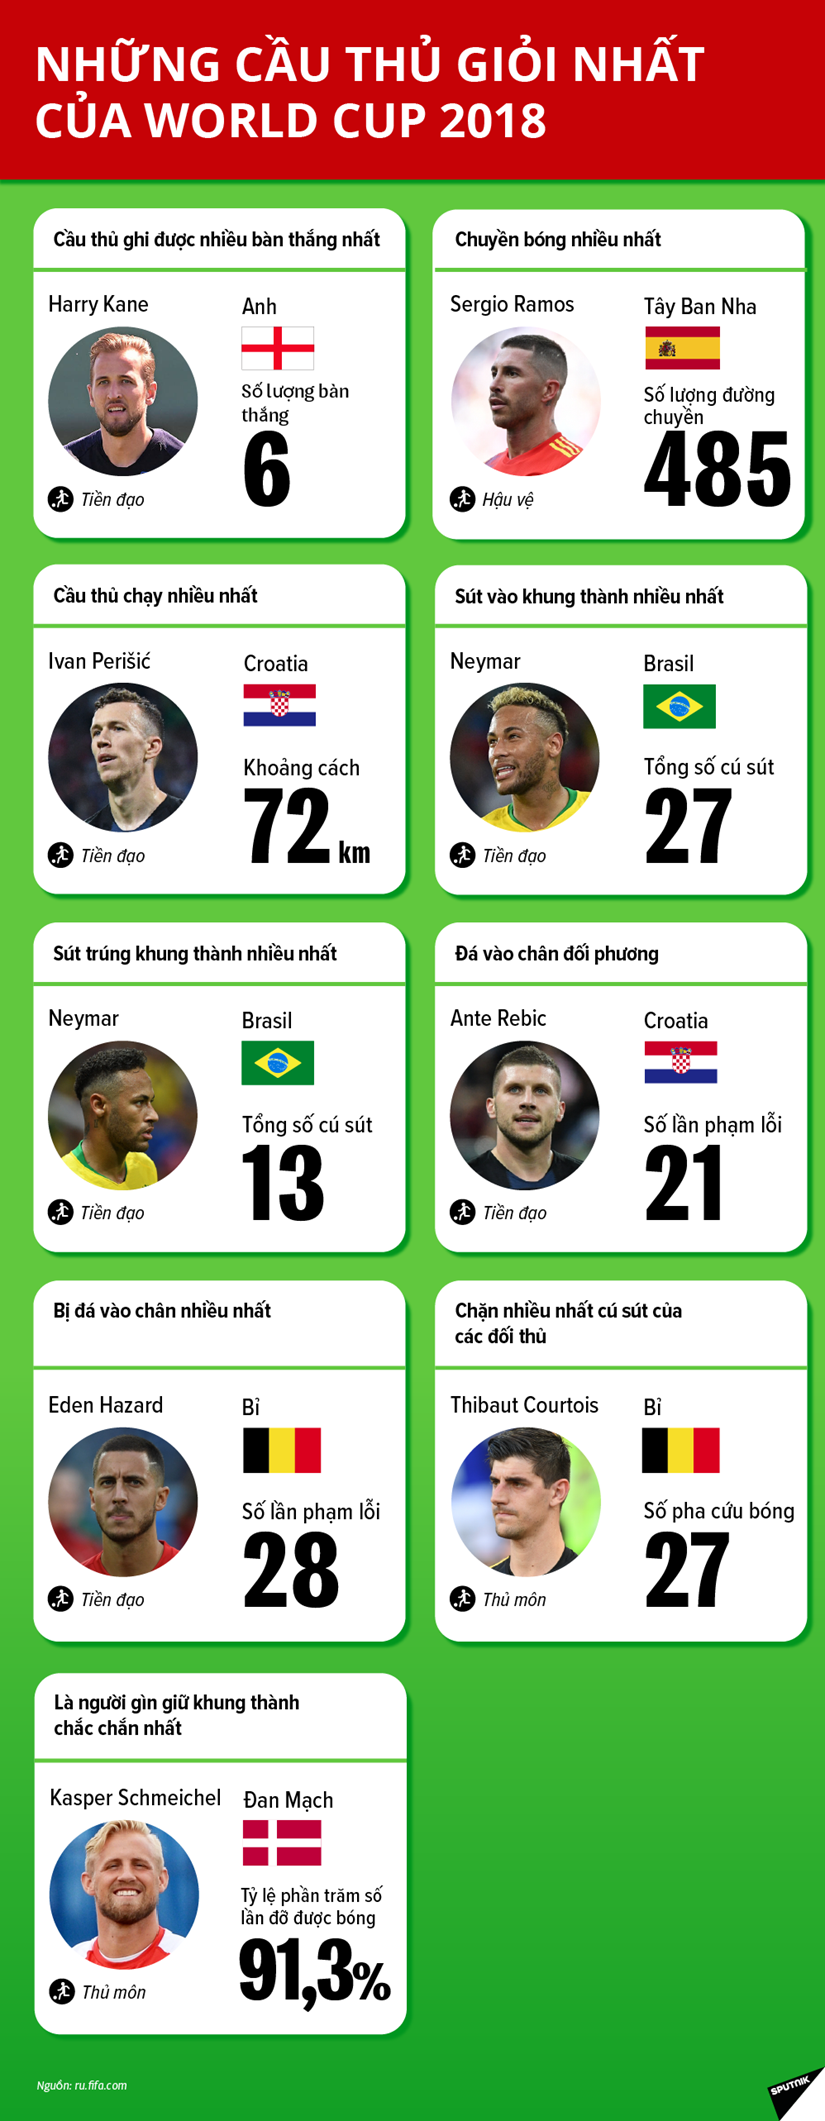 [Infographics] Nhung cau thu gioi nhat cua World Cup 2018 hinh anh 1